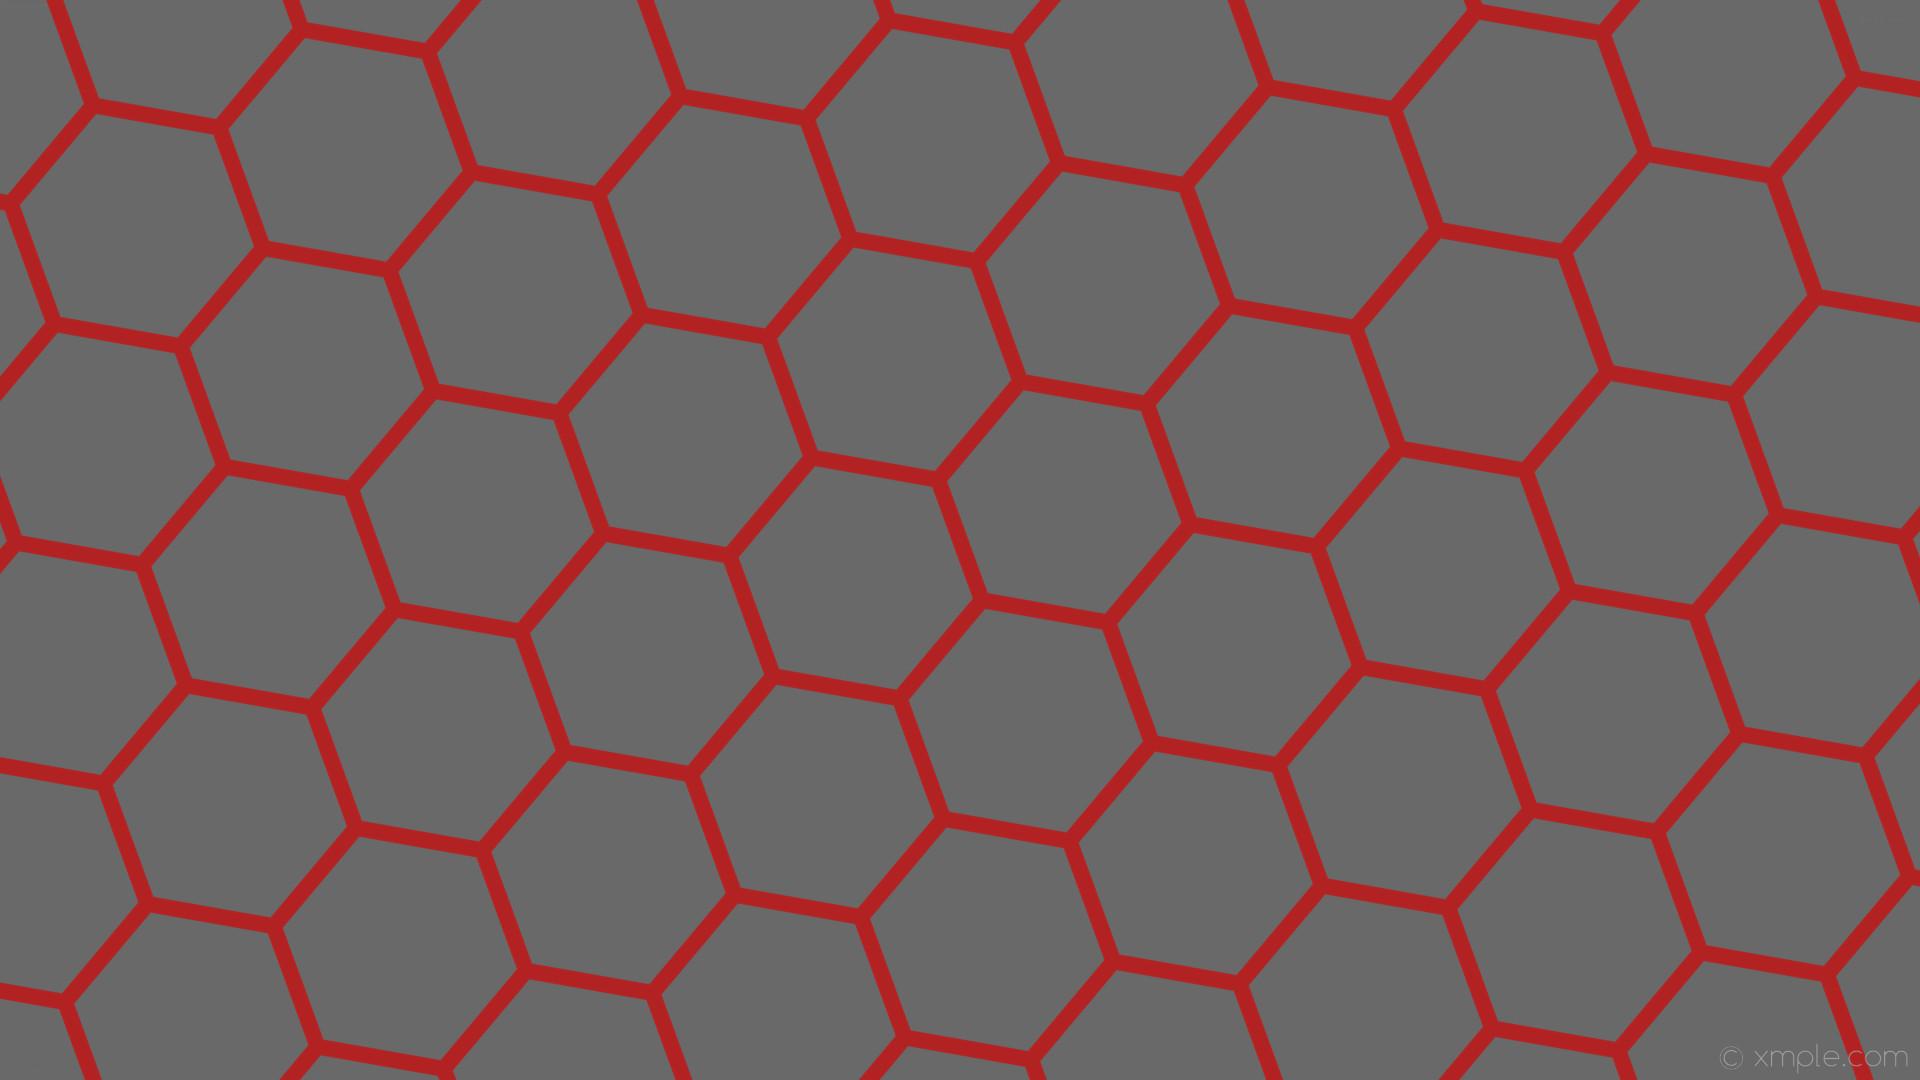 wallpaper hexagon beehive red honeycomb grey dim gray fire brick #696969  #b22222 diagonal 20